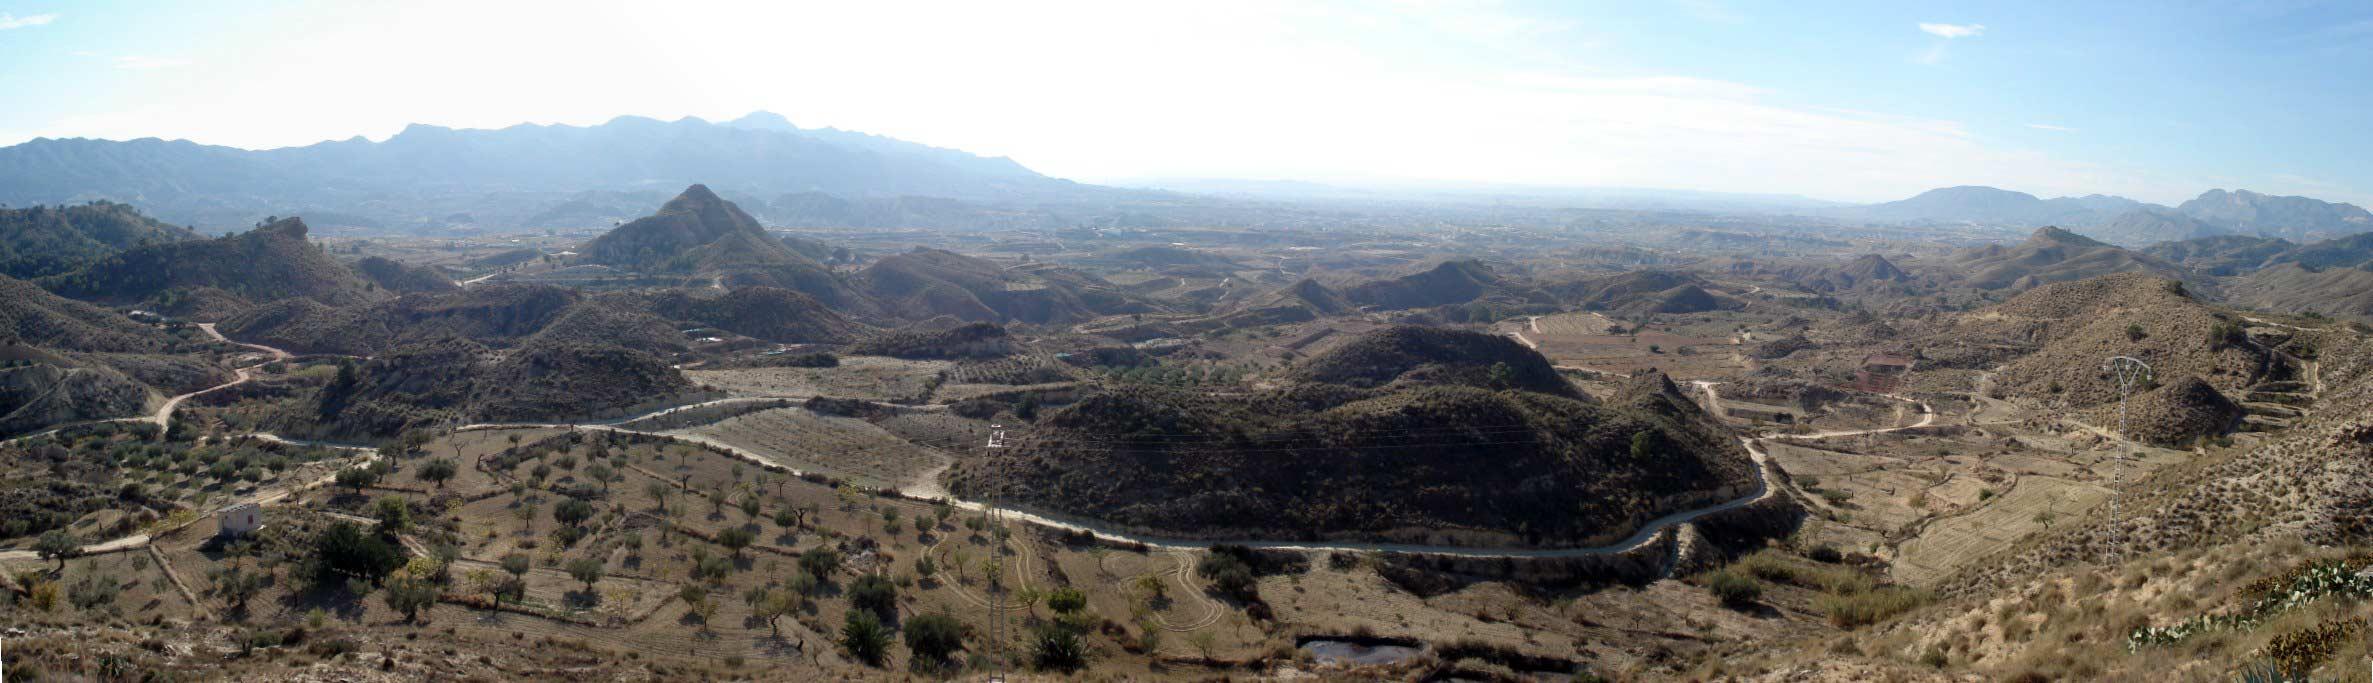 Panoramic Views of Abanilla. Macisvenda